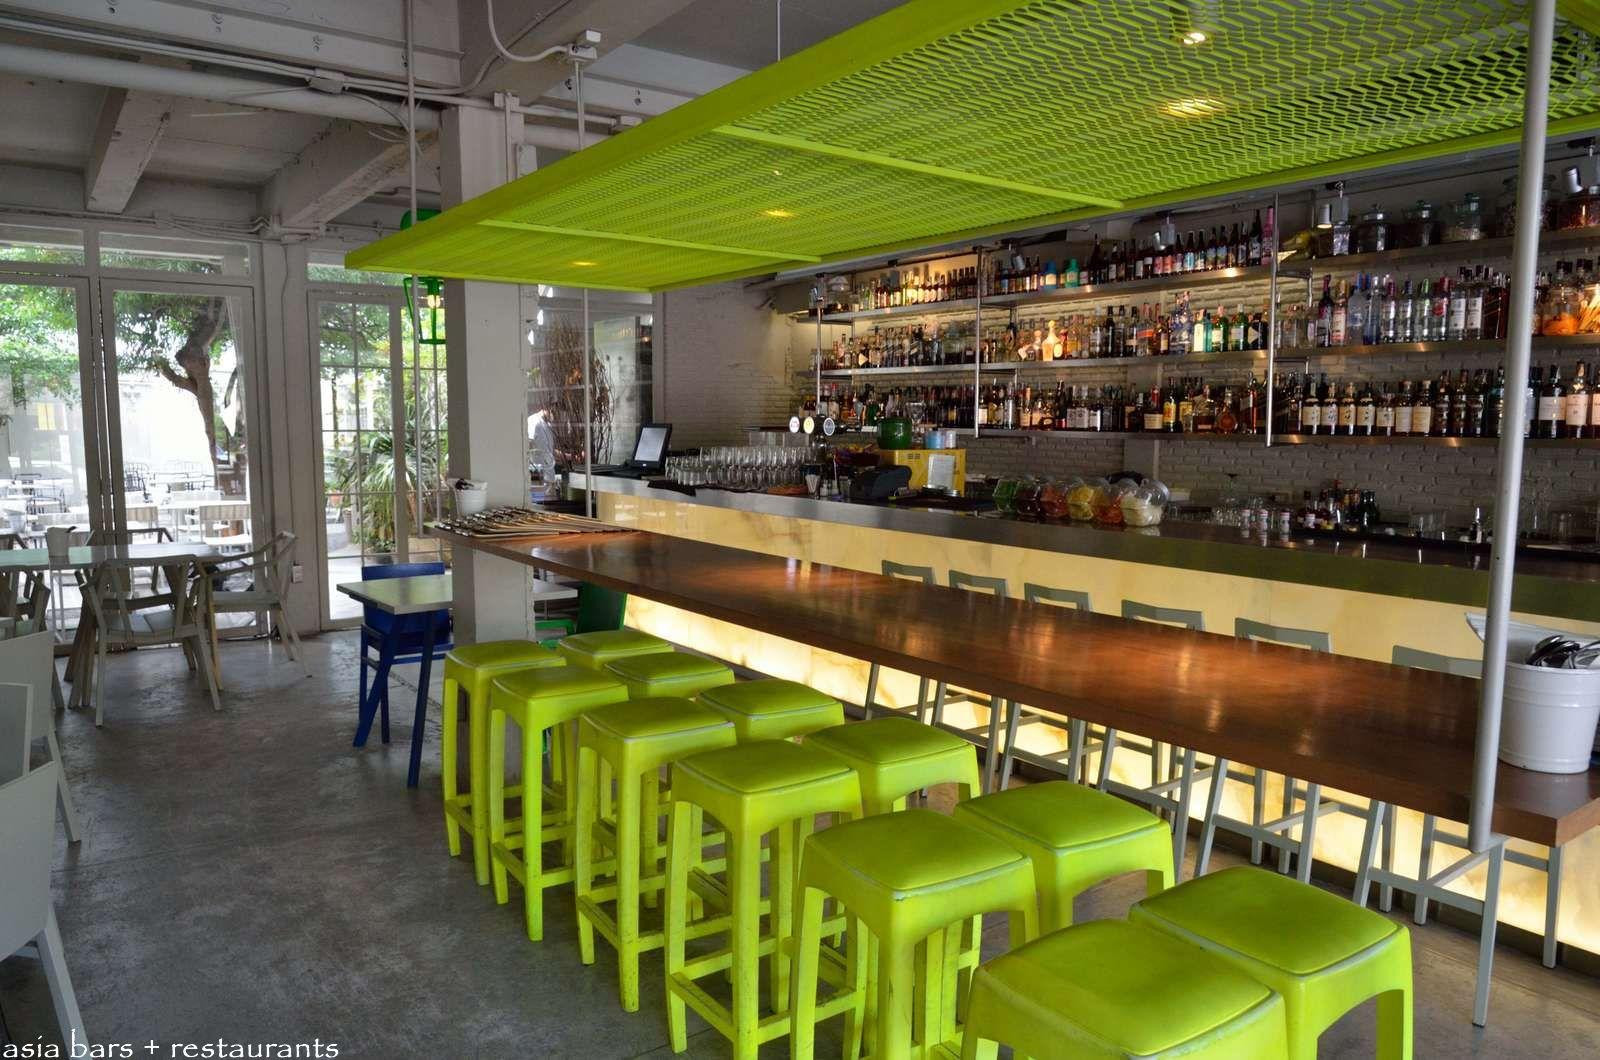 Badmotel restaurant bar modern thai street food for Chow chow restaurante